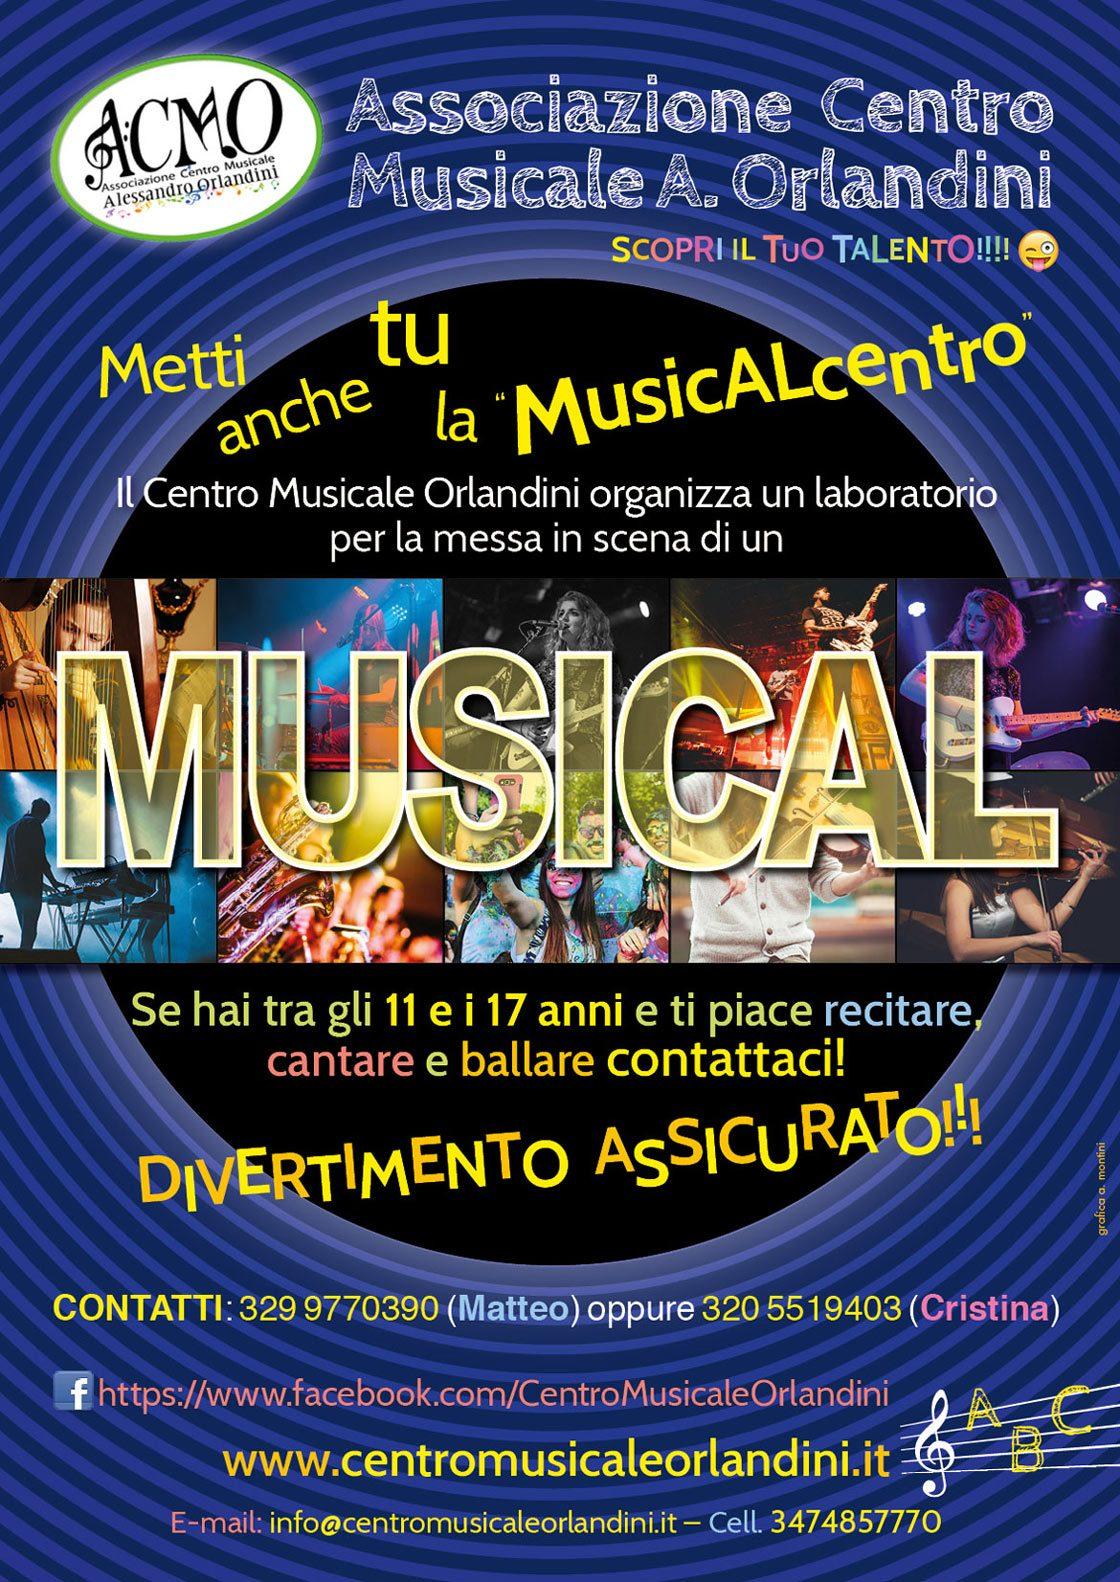 ACMO-MUSICAL